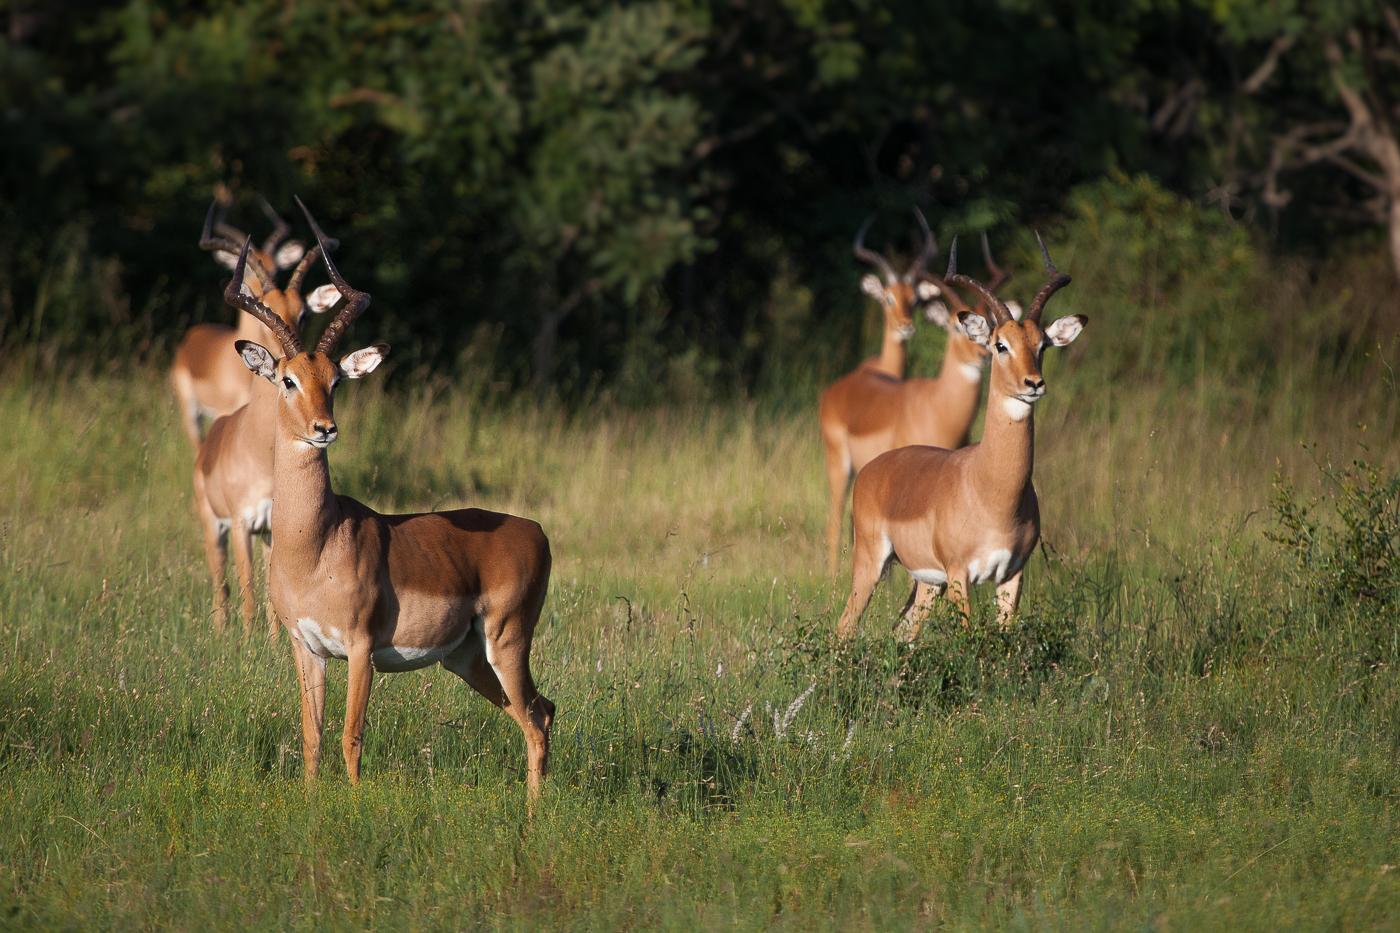 impalas in a row